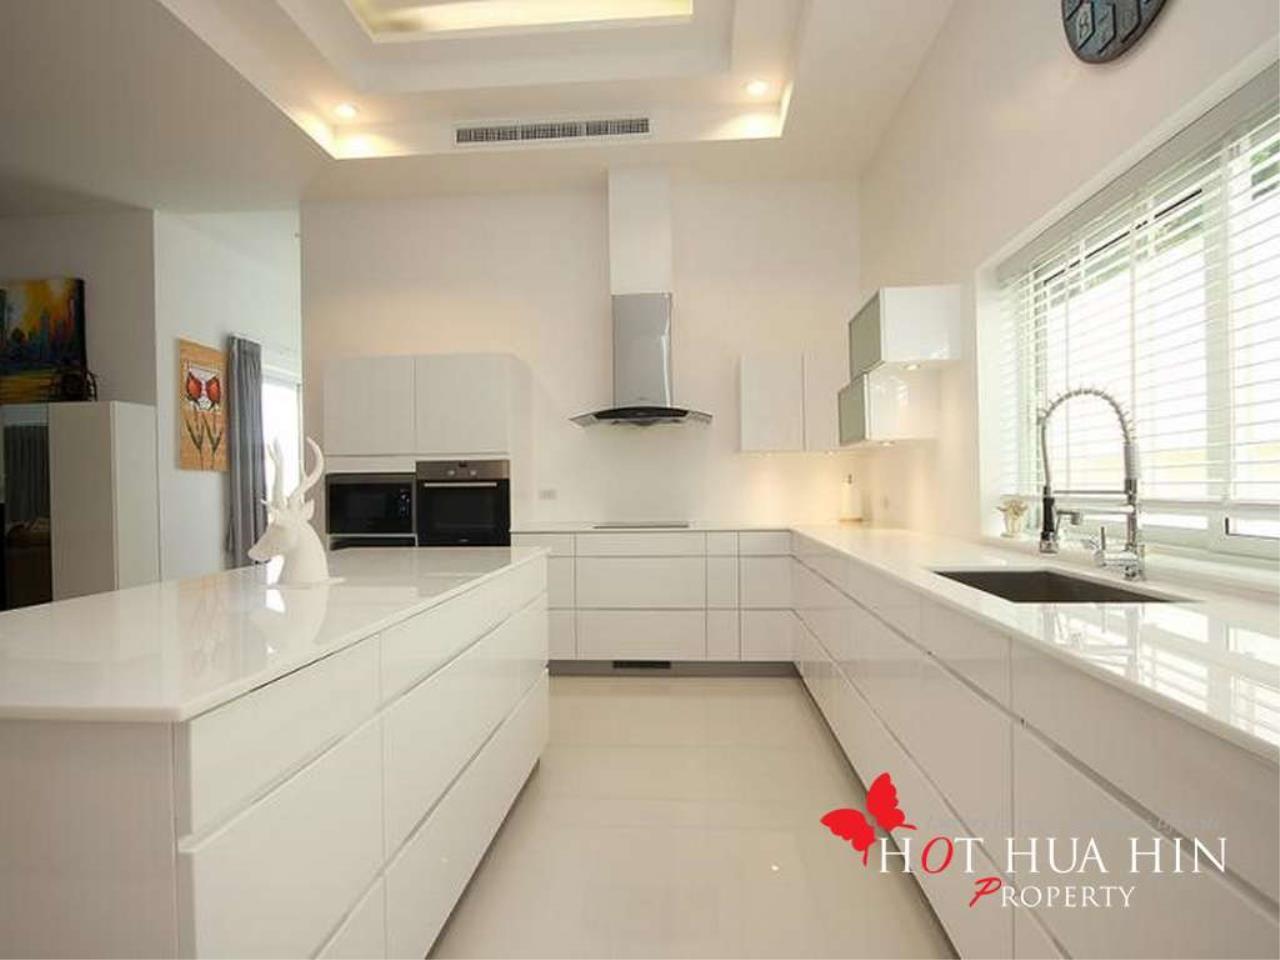 Hot Hua Hin Co. Ltd. Agency's New Luxury Smart Home In Popular Area 3